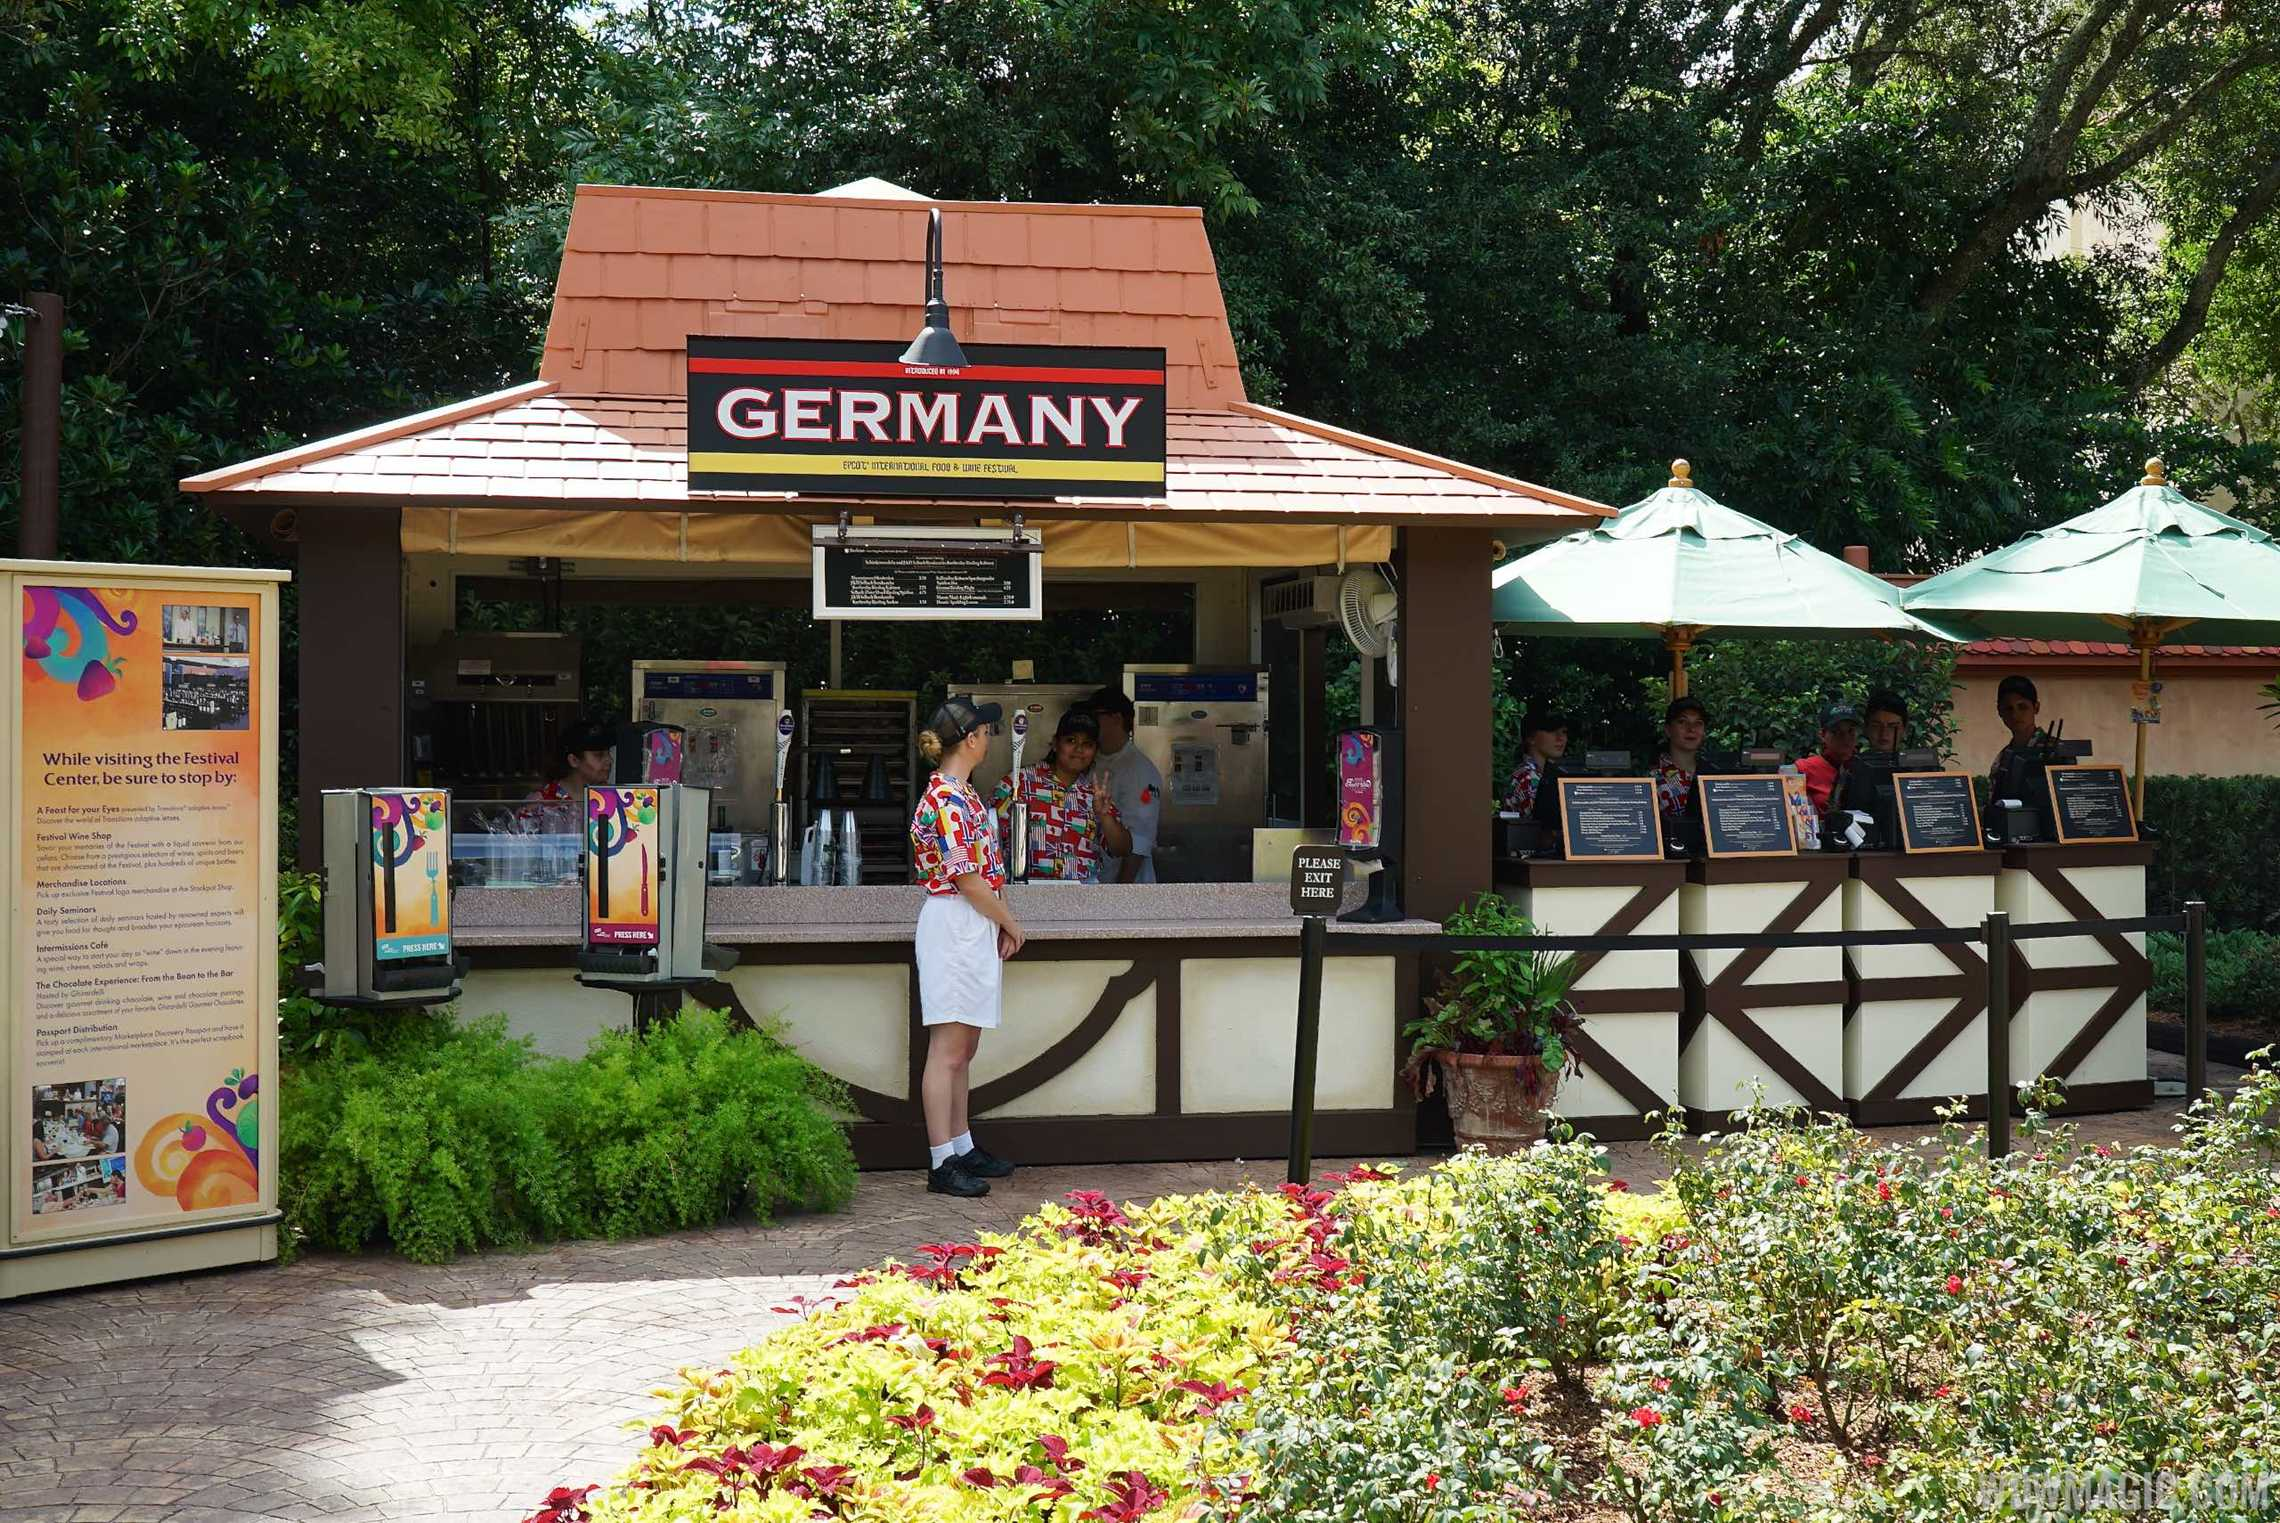 Germany Food and Wine kiosk